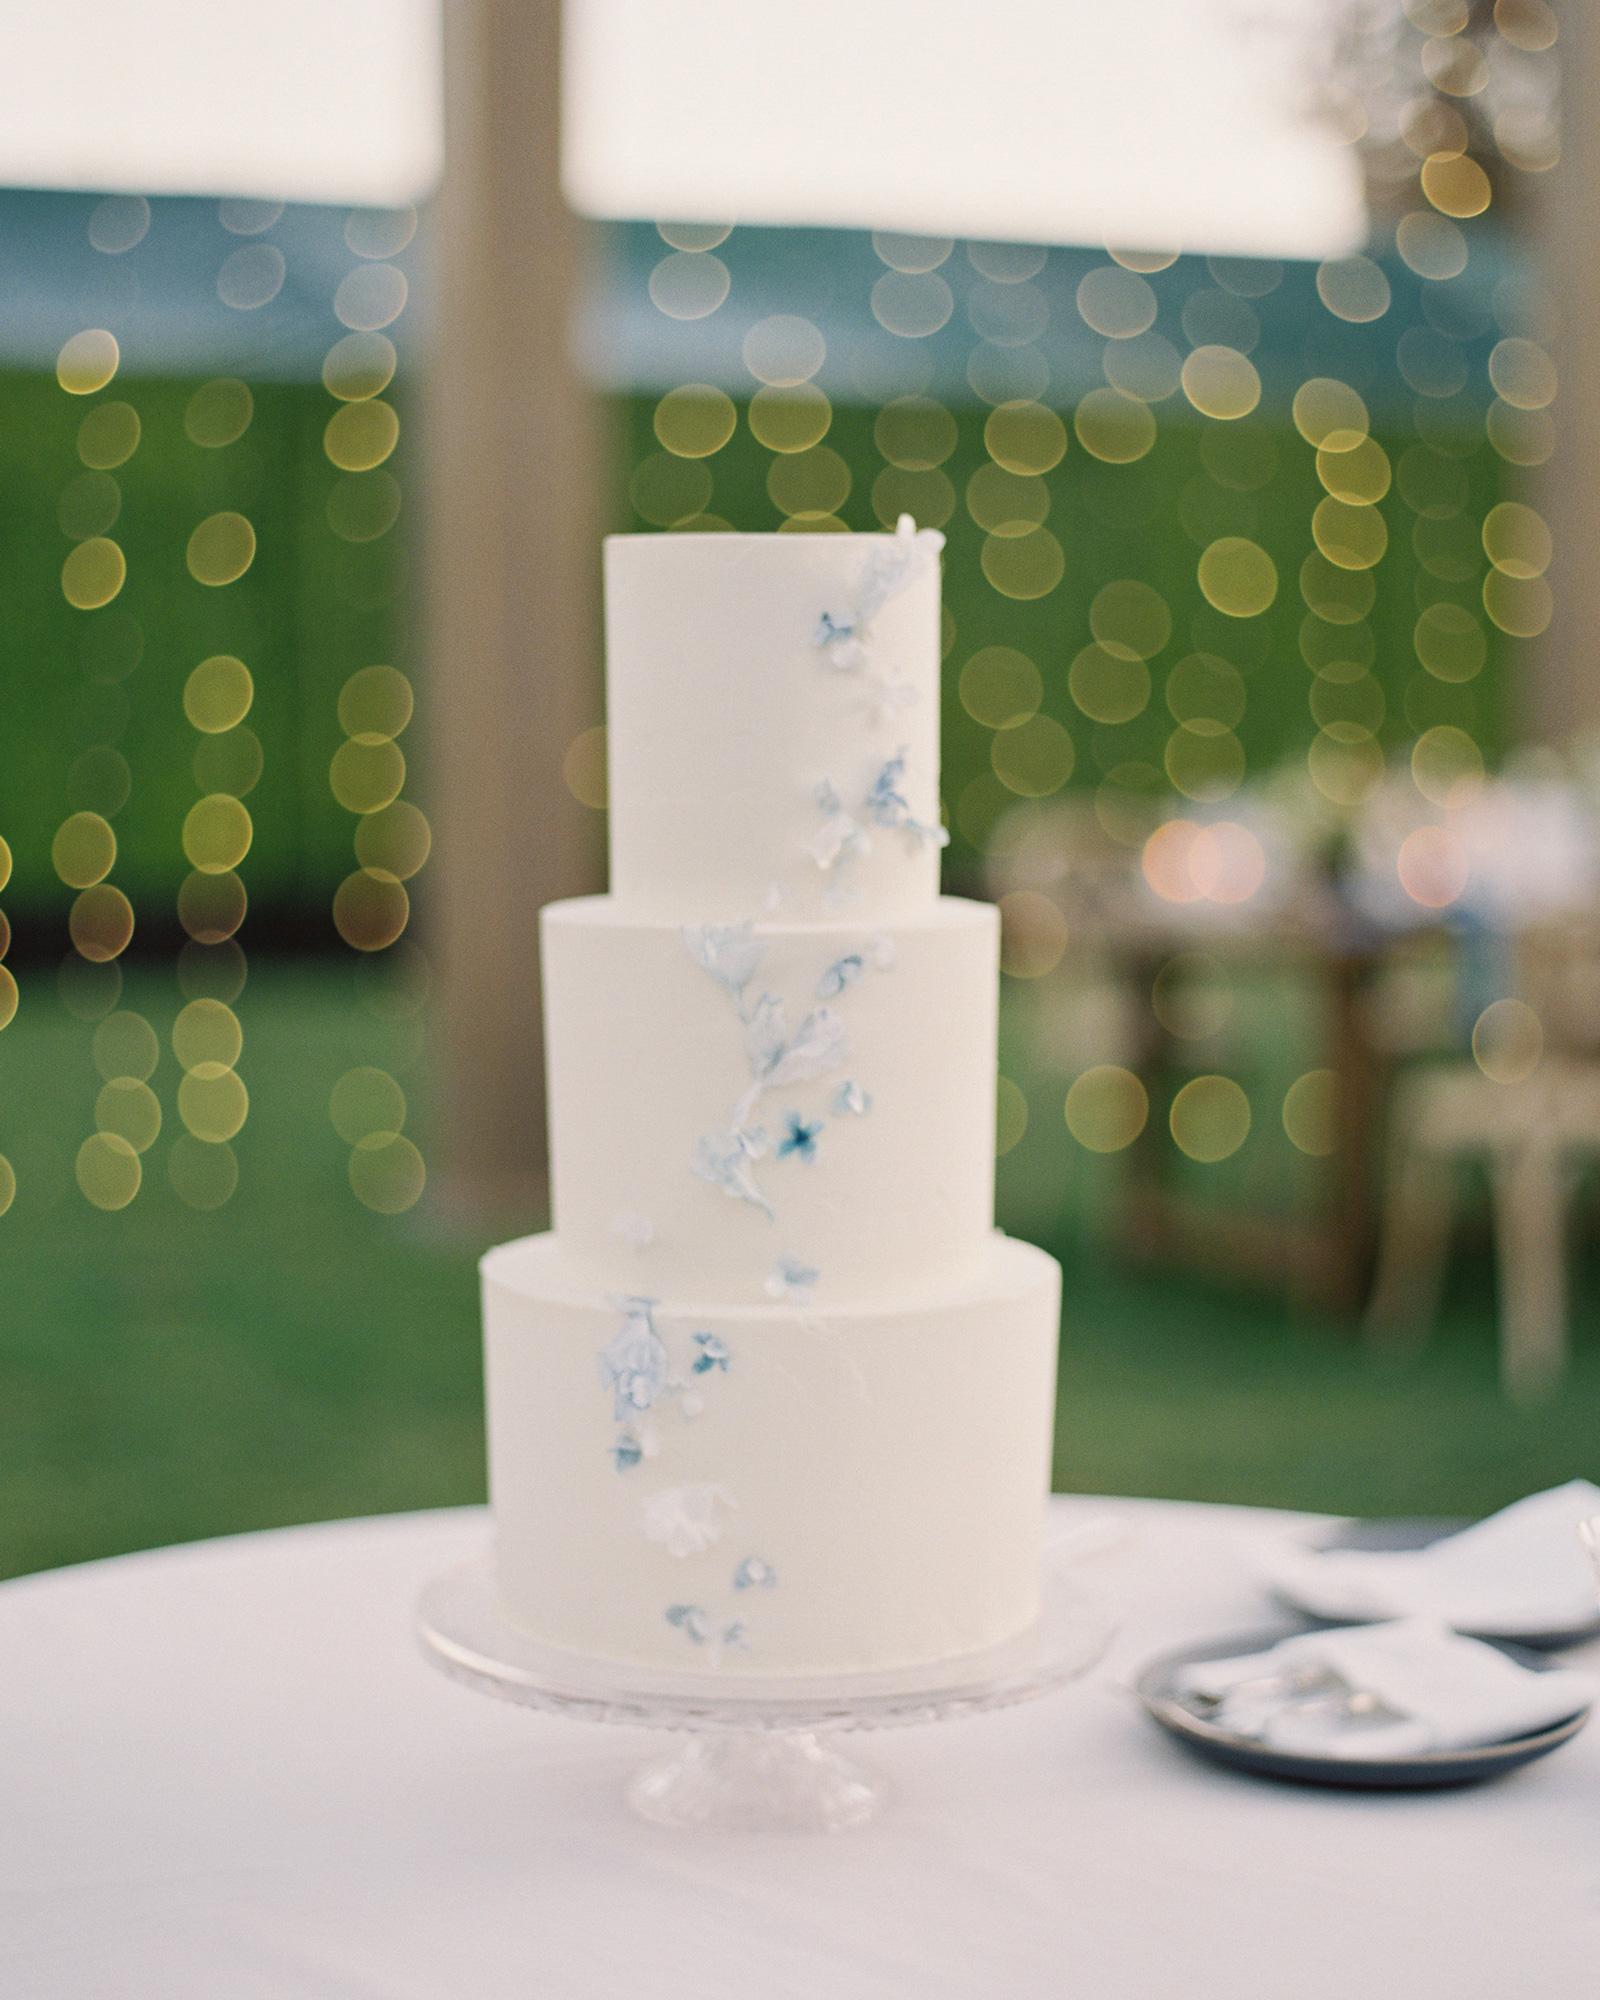 3-tiered white wedding cake blue and white embellishments